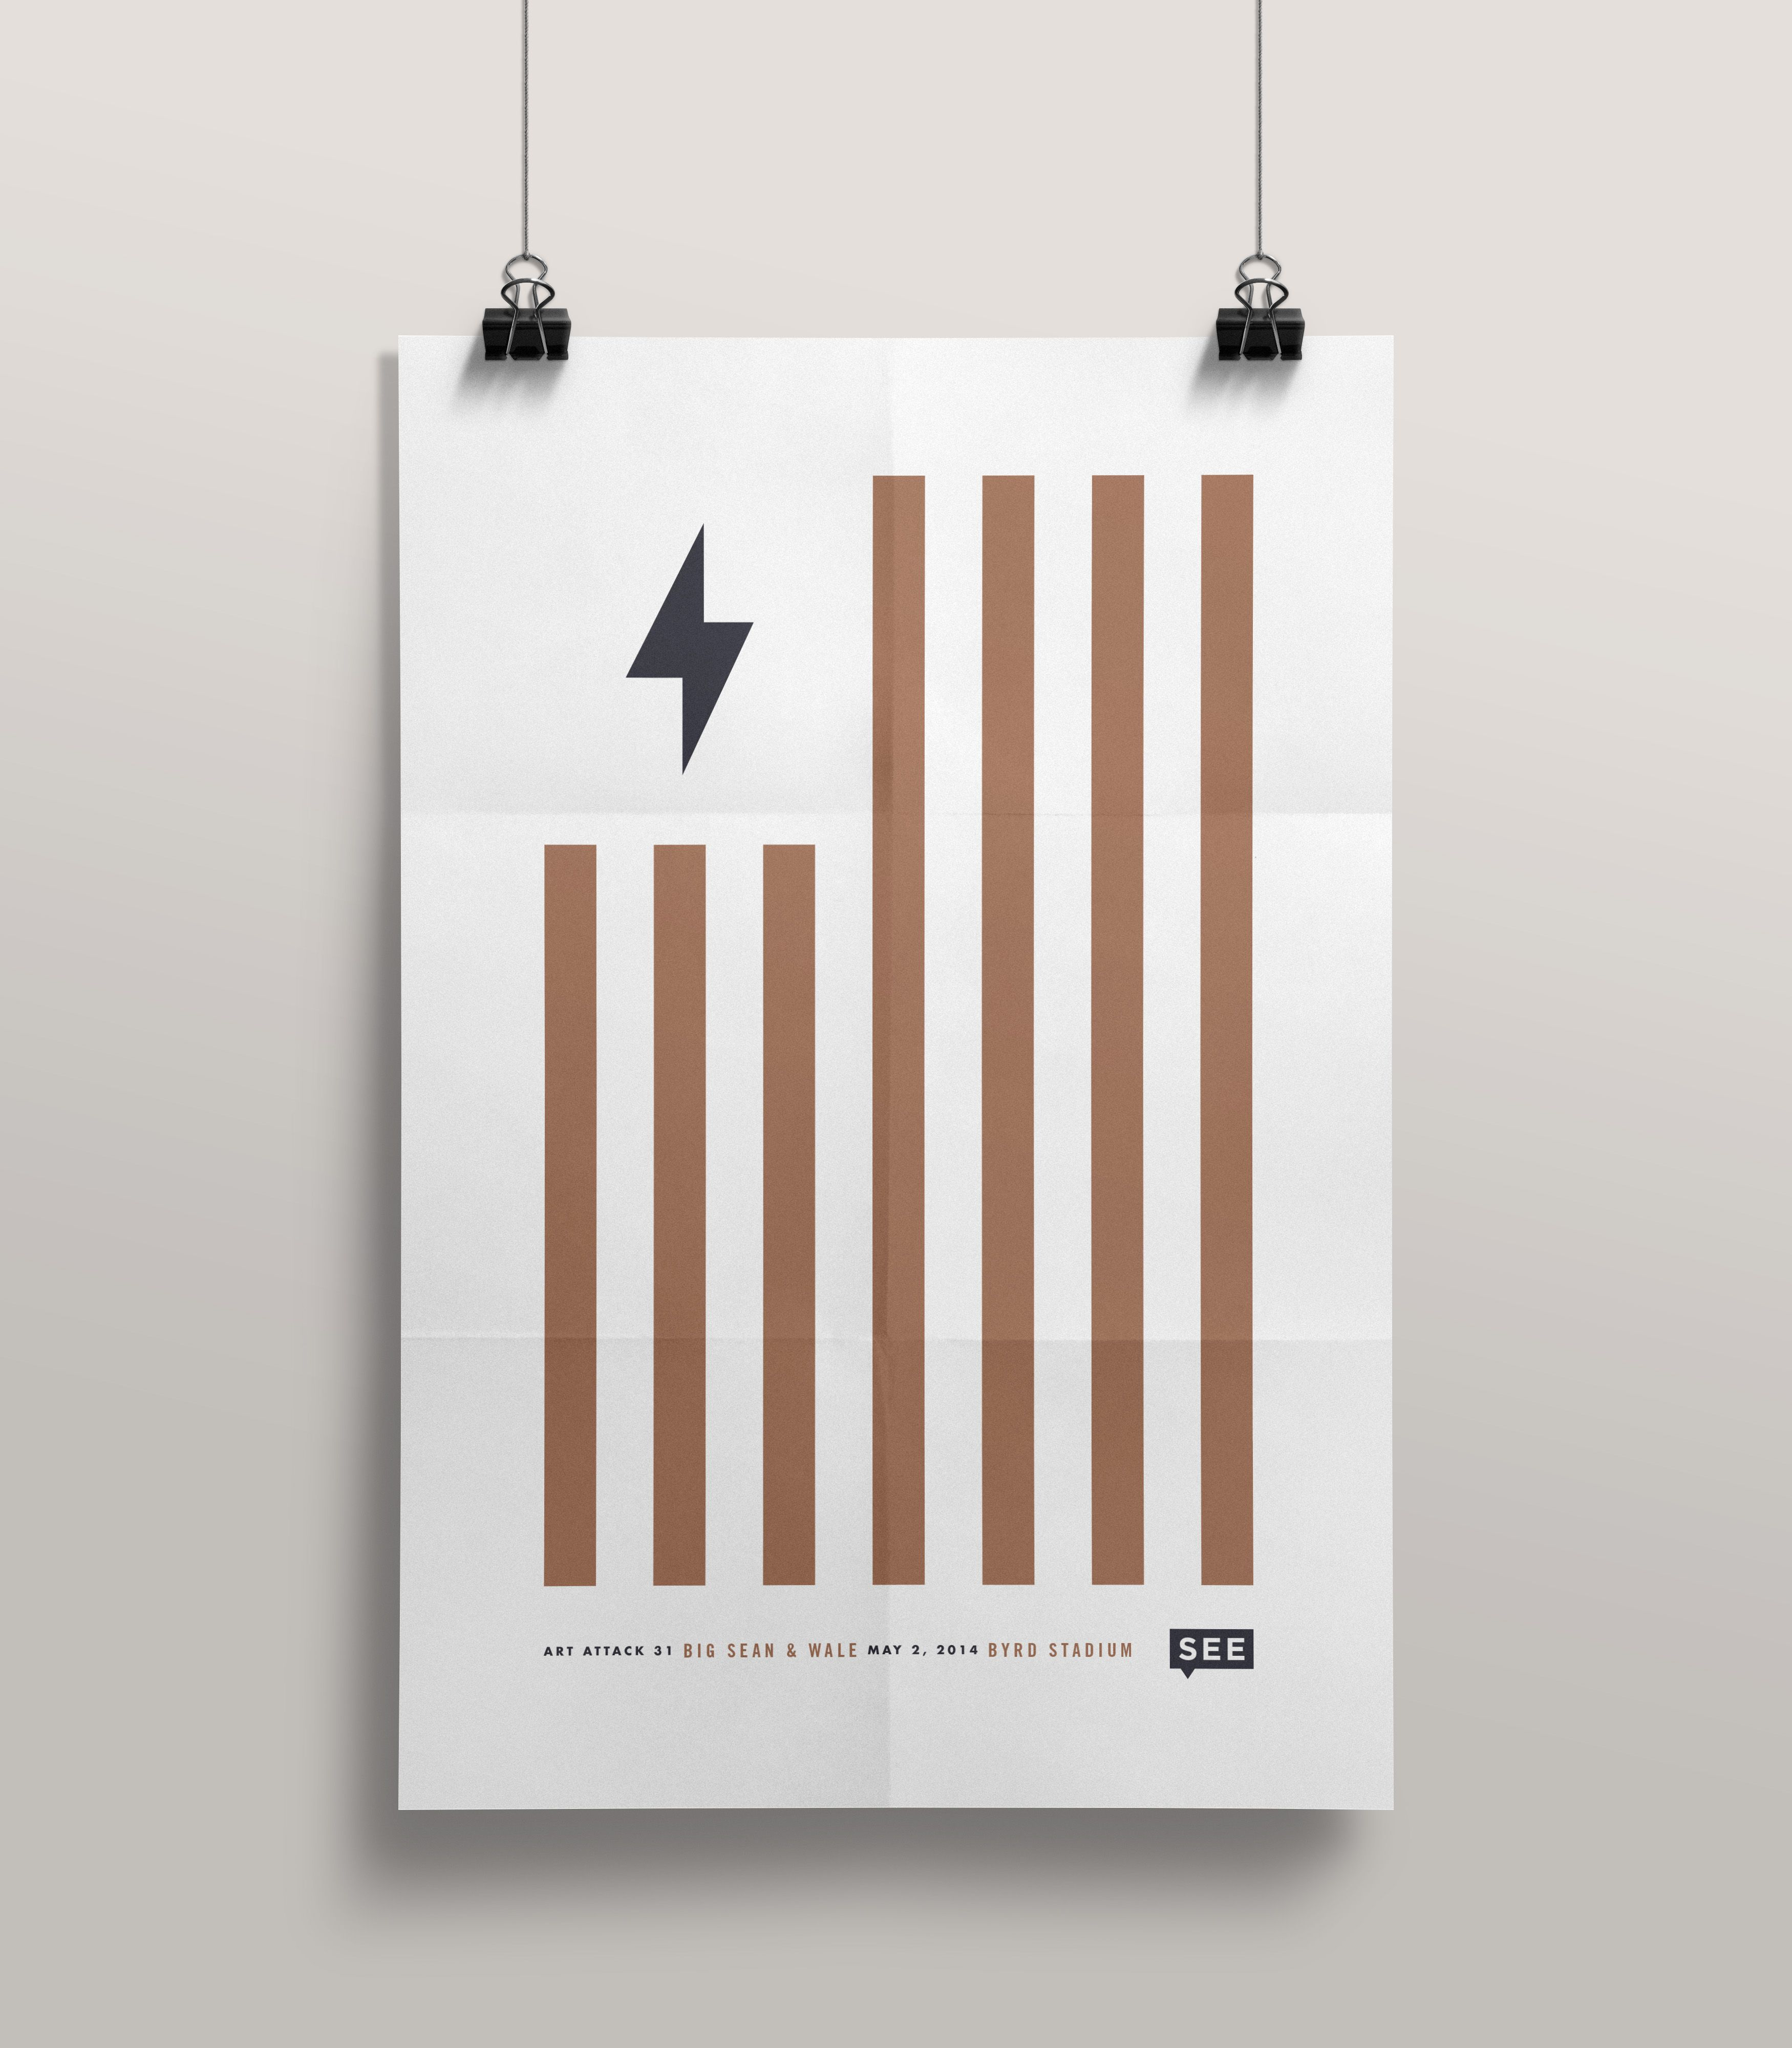 Minimalistic and bold - Art Attack 31poster | Designer: Chris Allen